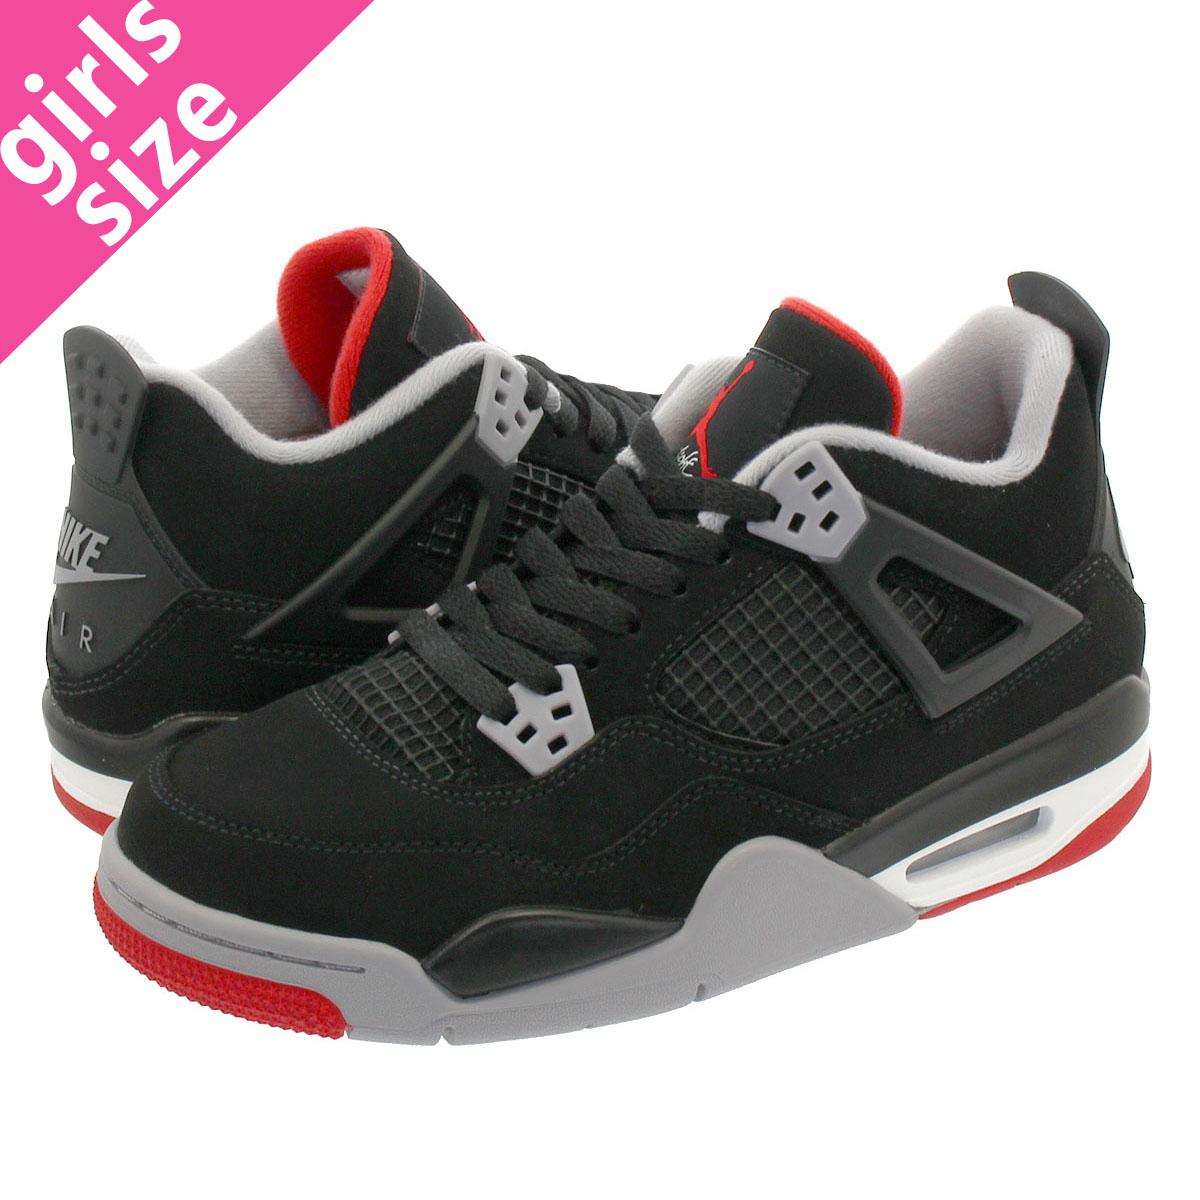 online store bac38 ecdf6 NIKE AIR JORDAN 4 RETRO BG Nike air Jordan 4 nostalgic BG BLACK/CEMENT  GREY/SUMMIT WHITE/FIRE RED 408,452-060